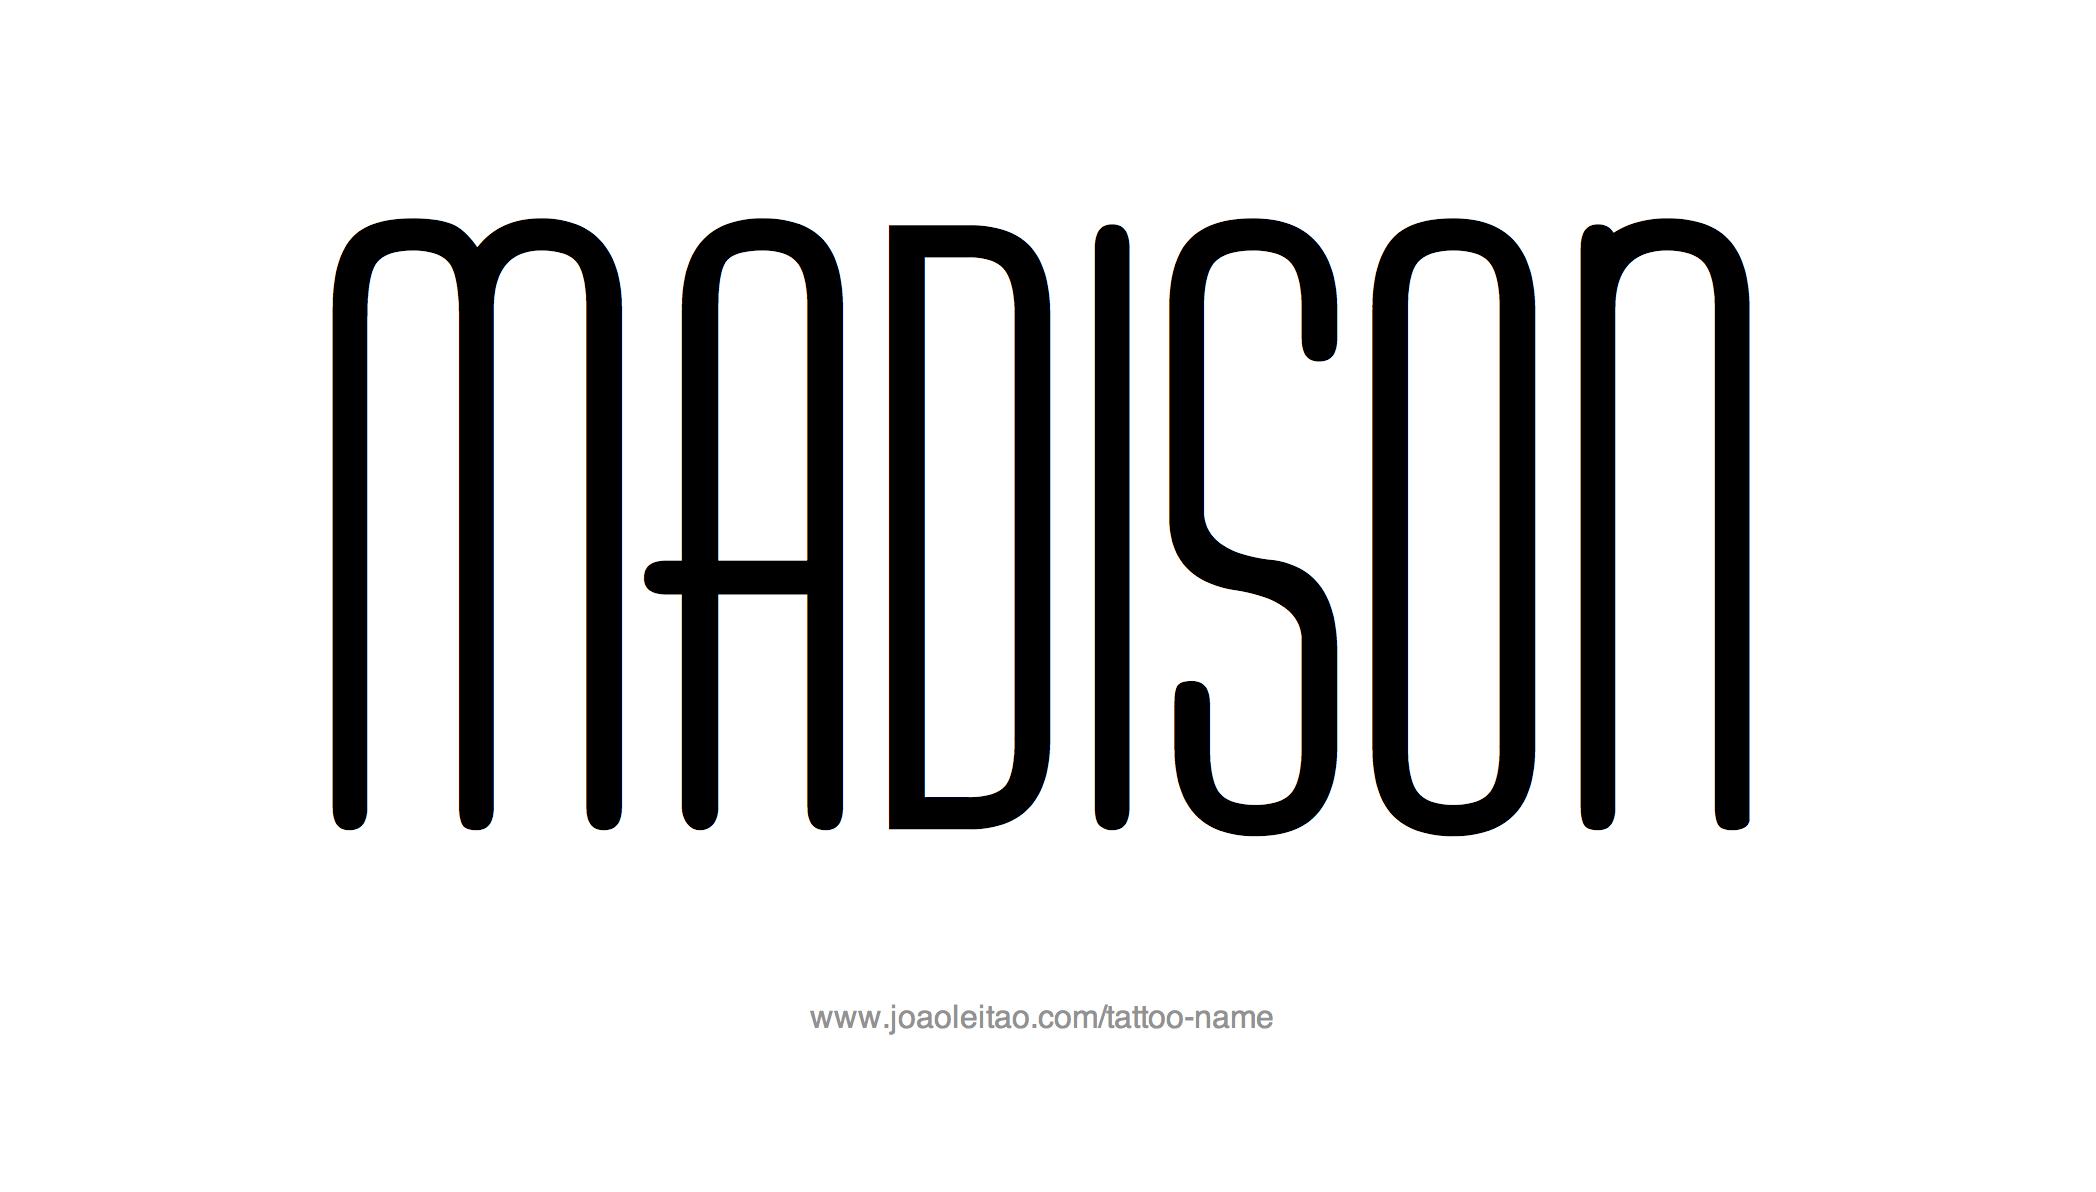 madison name tattoo designs. Black Bedroom Furniture Sets. Home Design Ideas